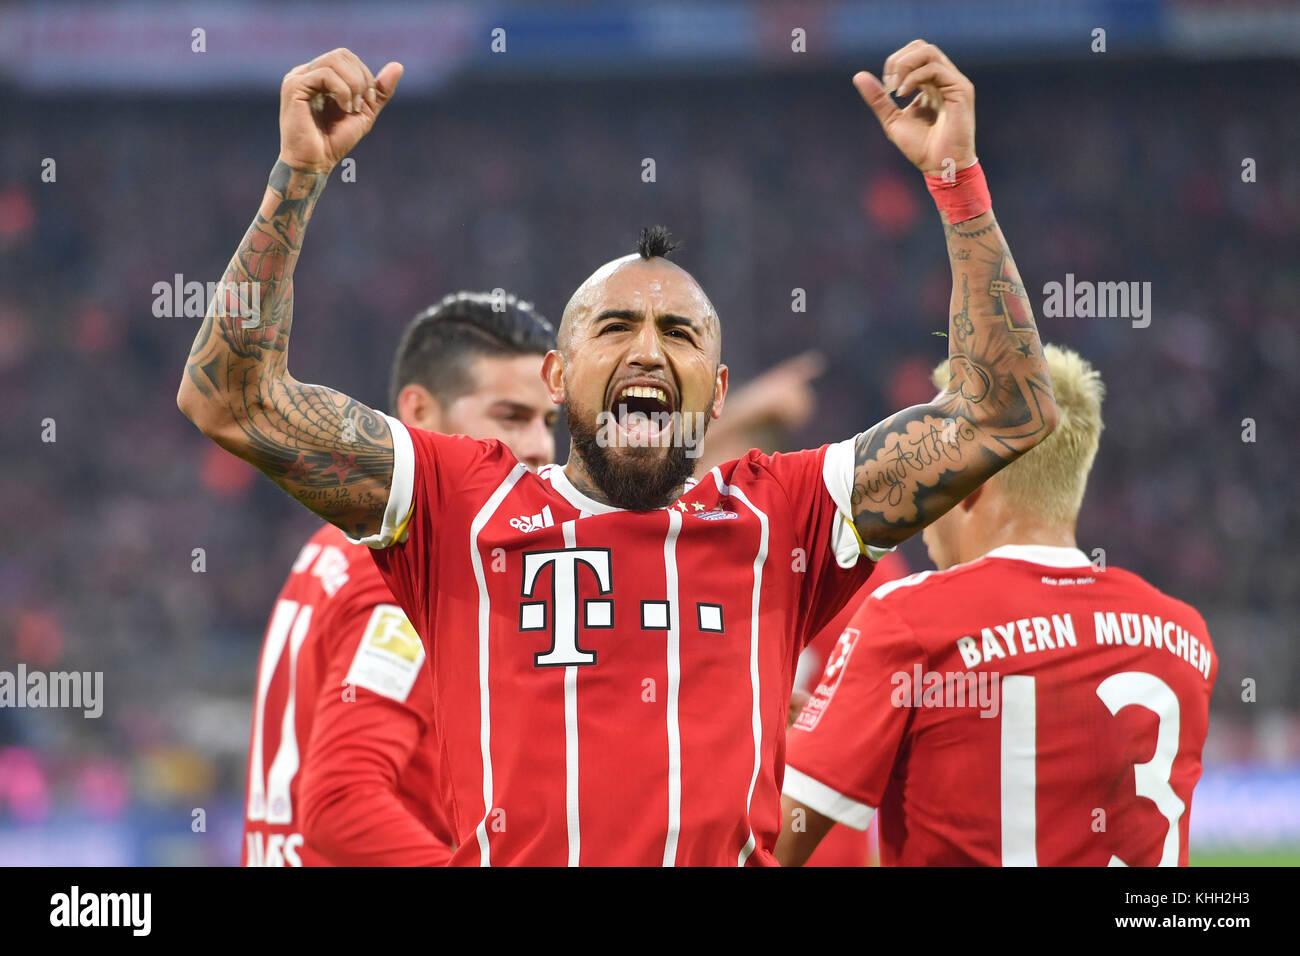 goaljubel Arturo VIDAL (FC Bayern Munich) after goal zum 1-0, Aktion, jubilation, Freude, Begeisterung, Fussball - Stock Image